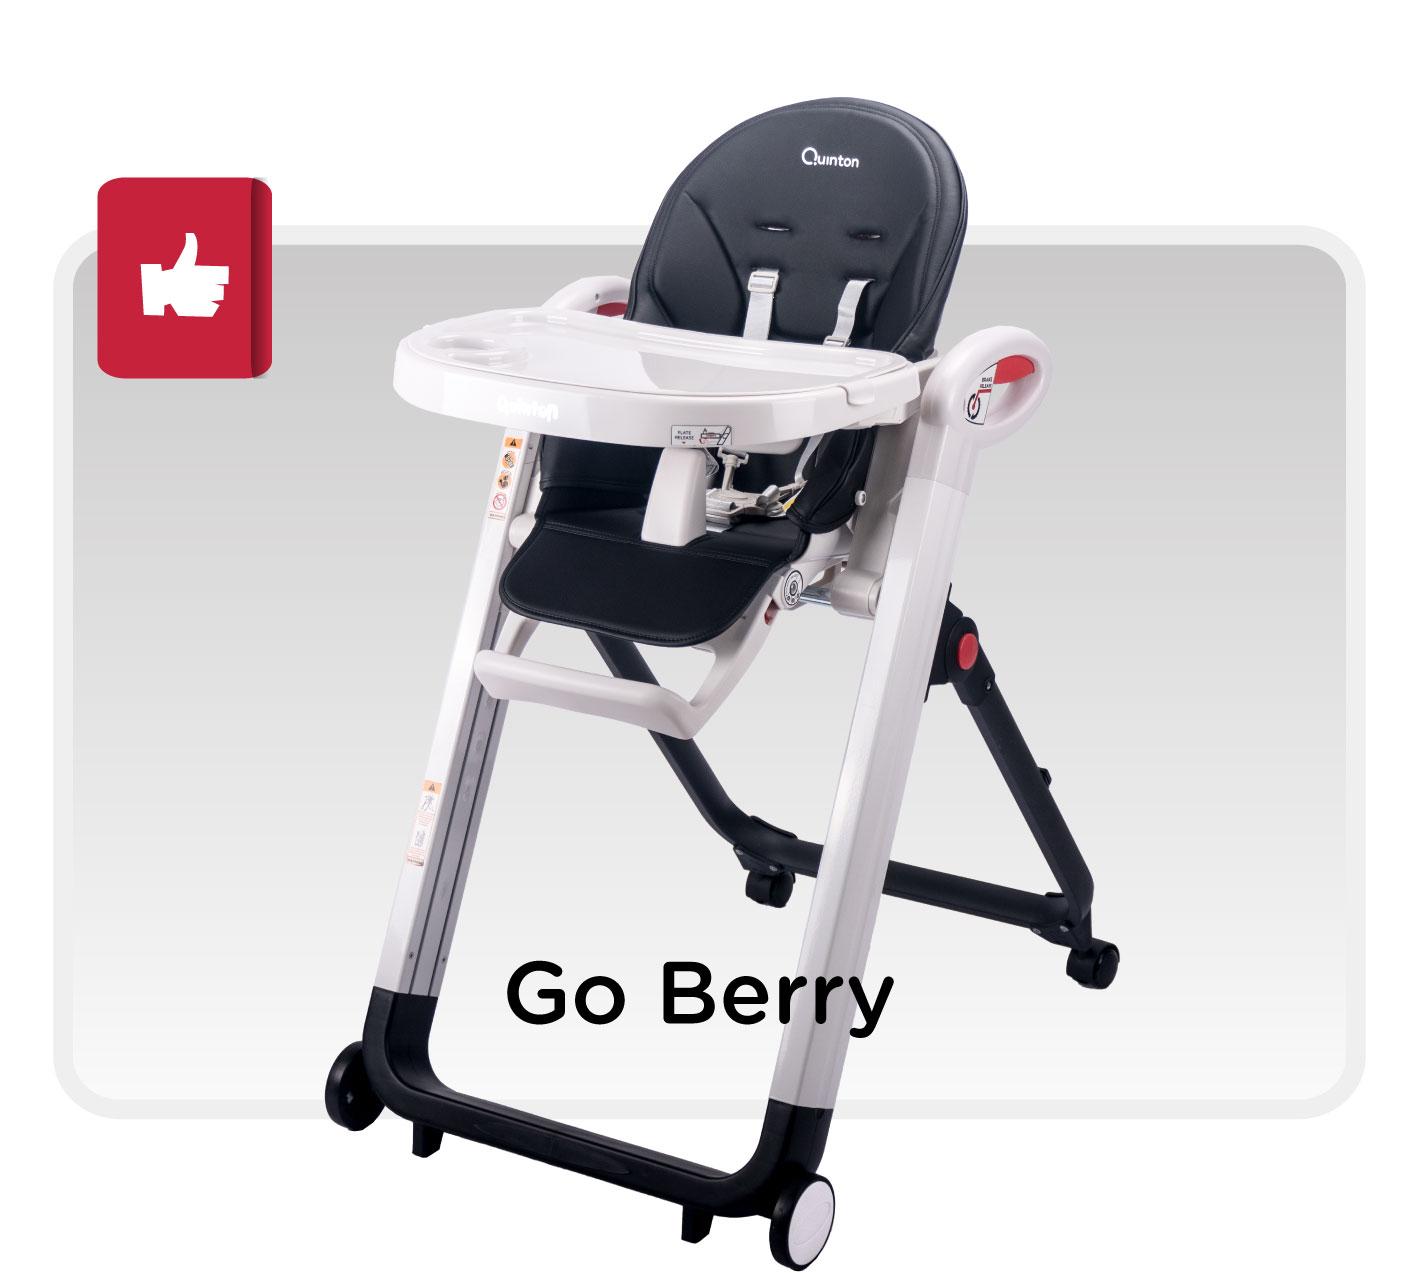 Quinton Go Berry High Chair